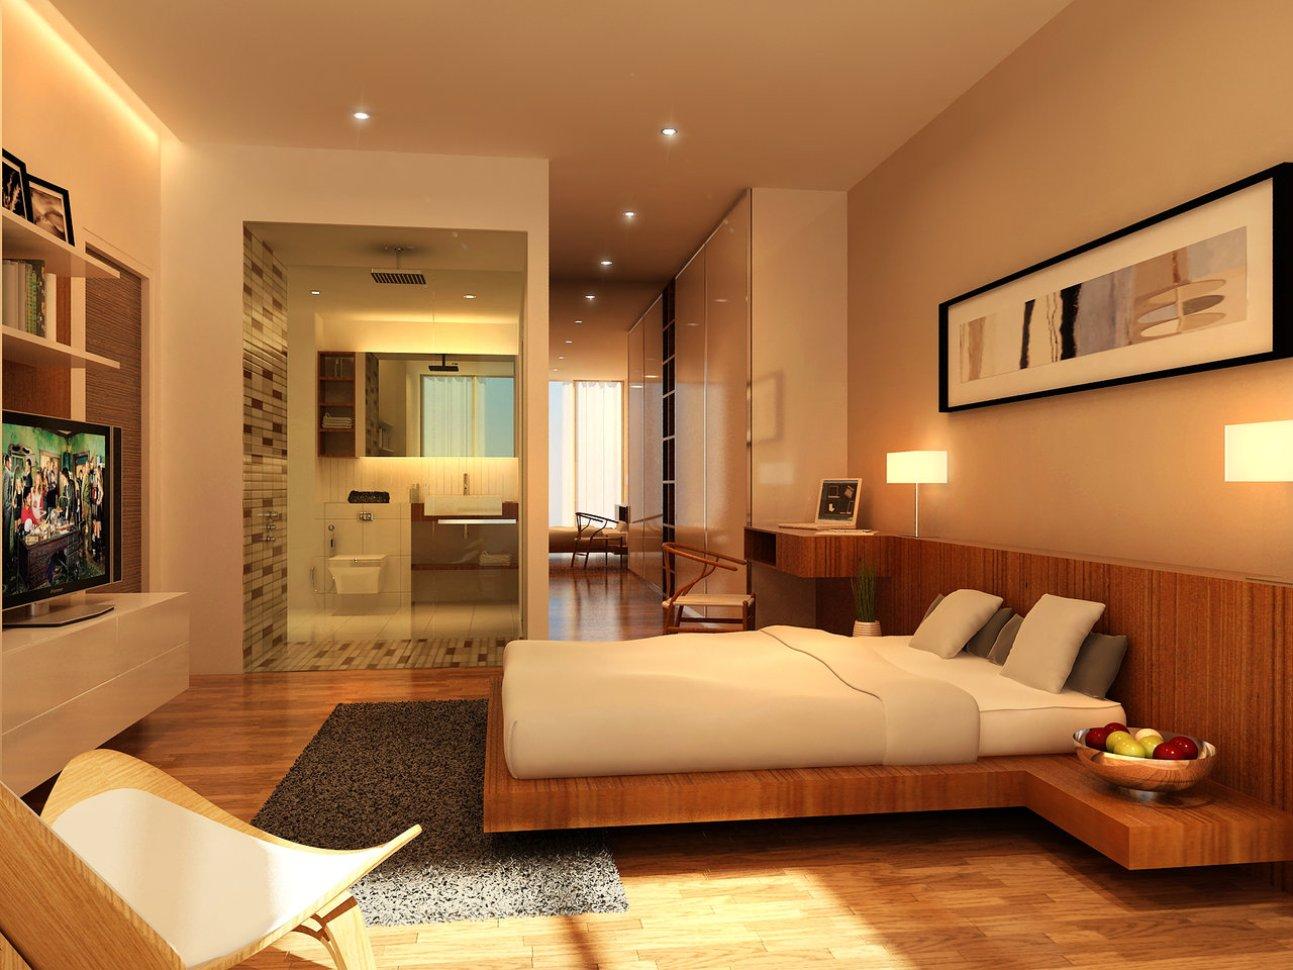 Best Kitchen Gallery: Interior Bedroom Design Charming Brown Wood Bed Frame On Bined of Interior Design Bedroom  on rachelxblog.com